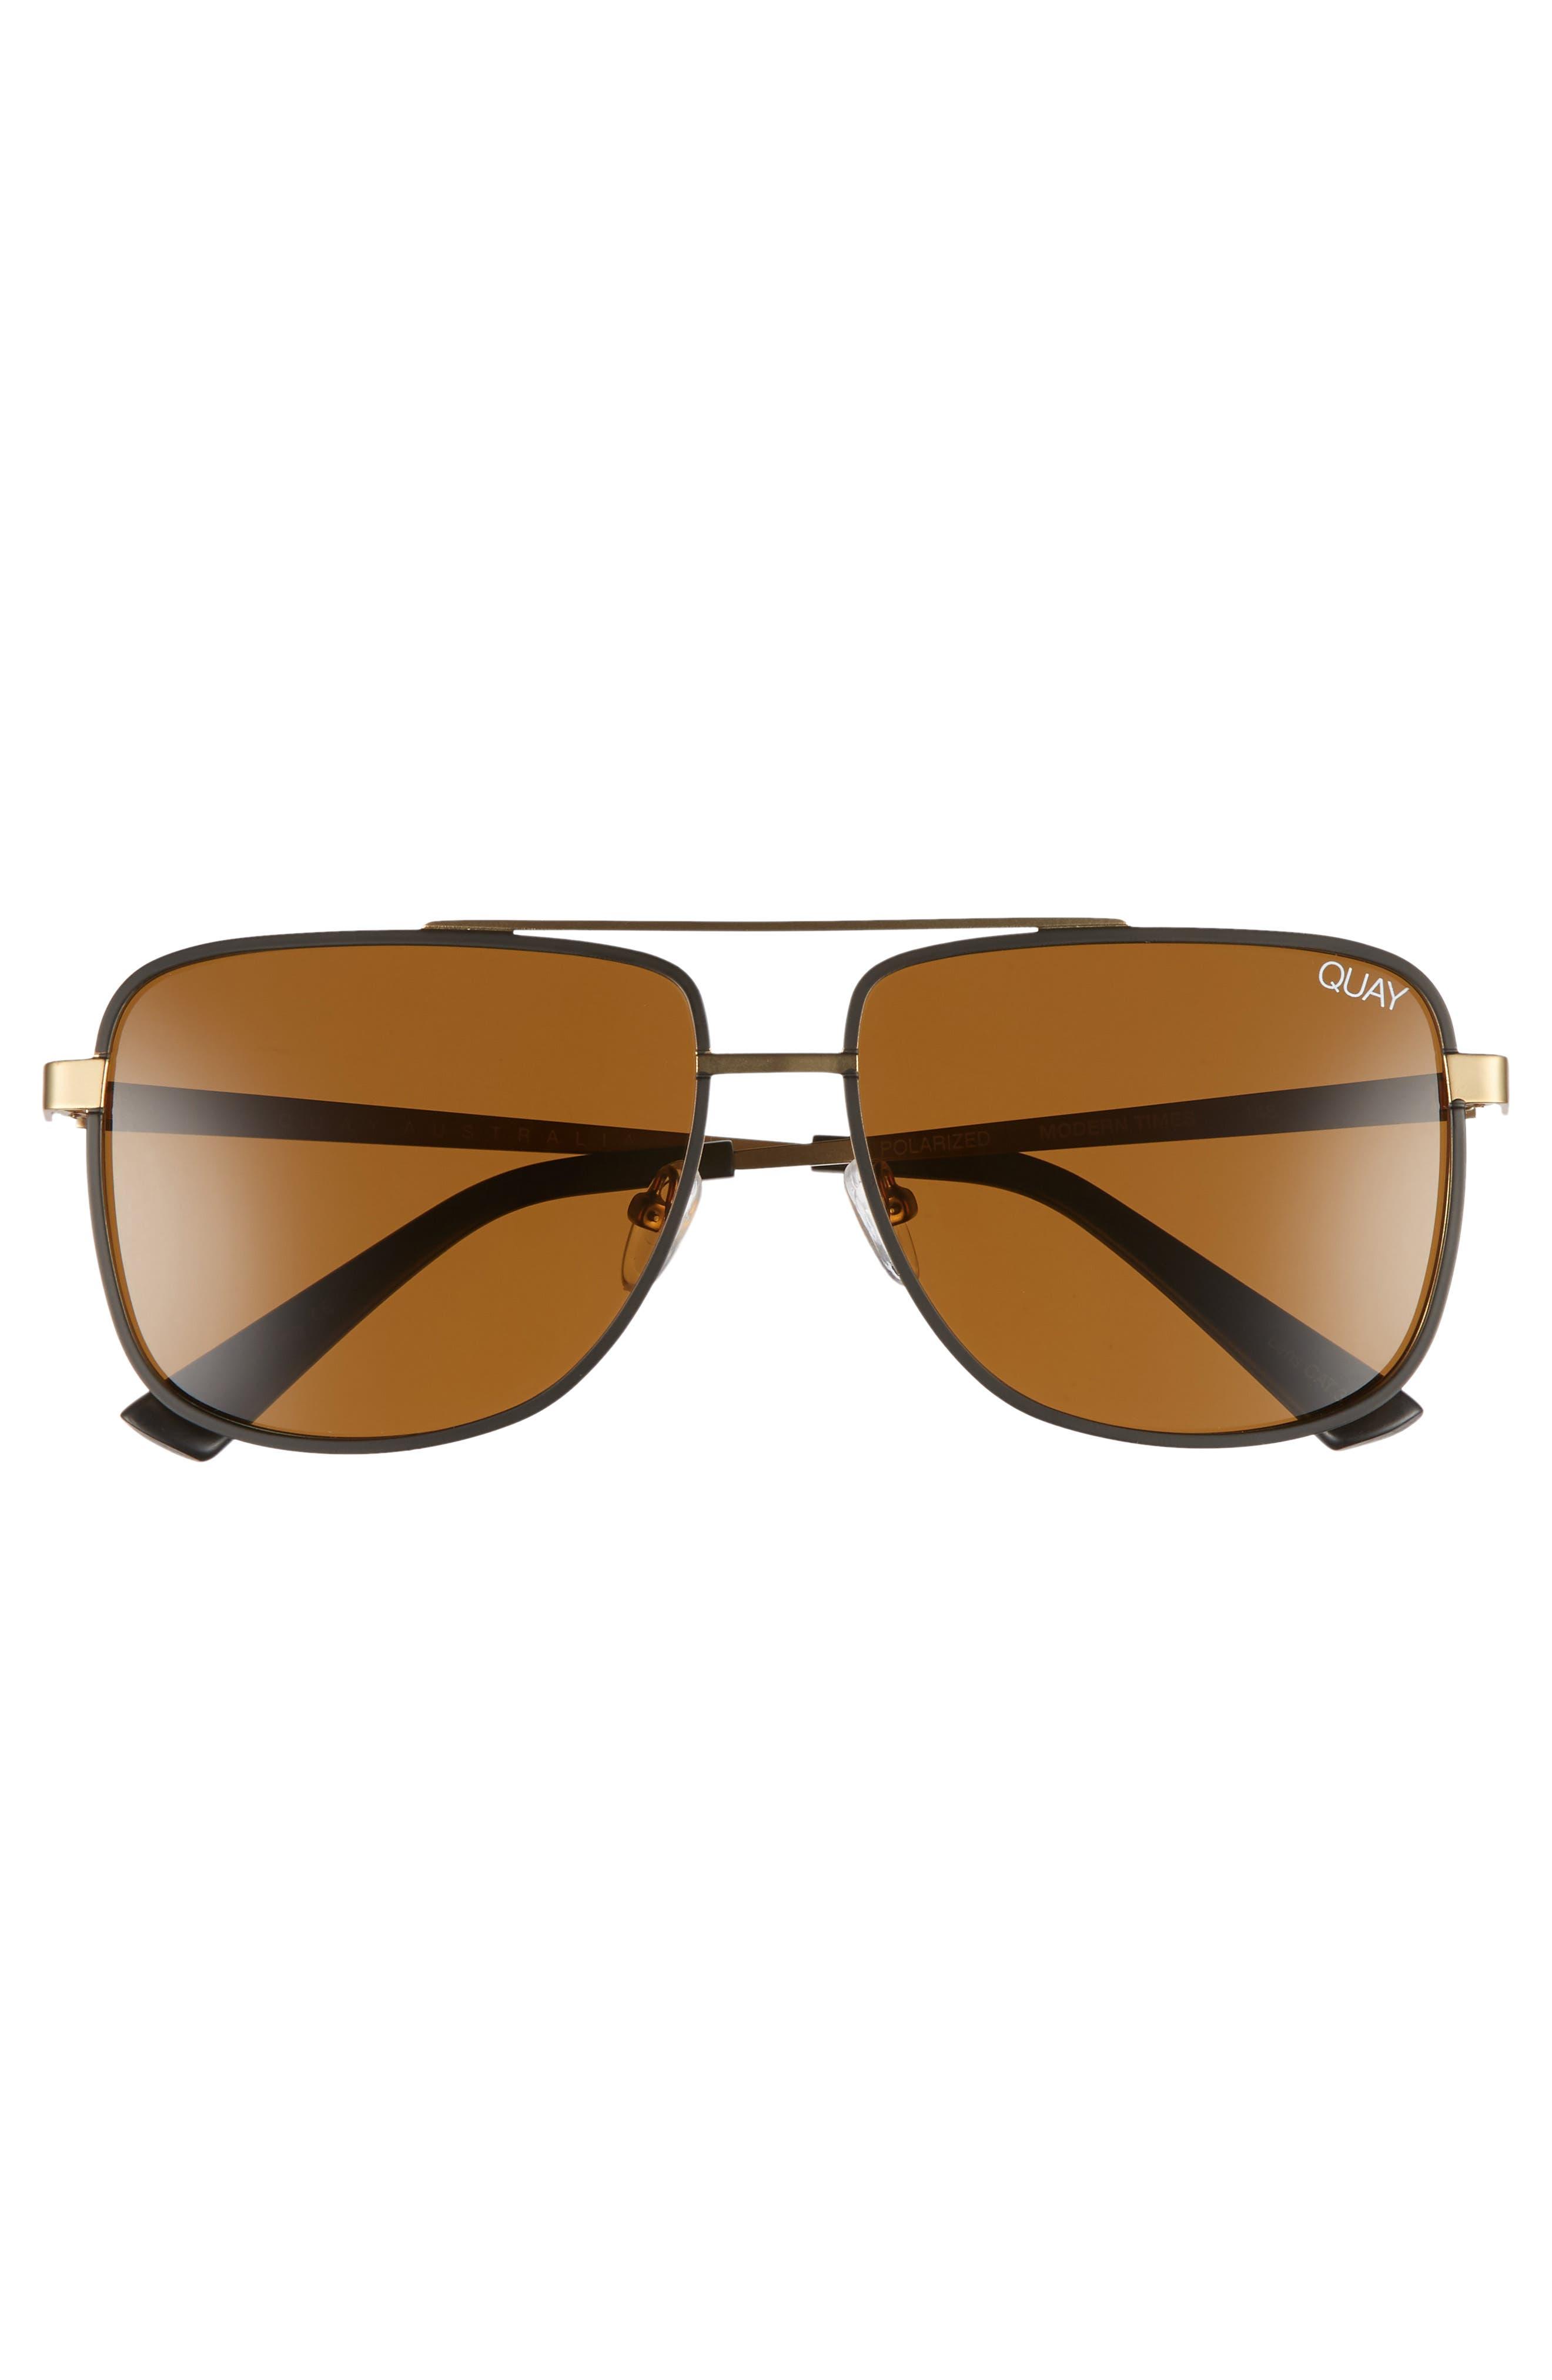 Modern Times 57mm Polarized Aviator Sunglasses,                             Alternate thumbnail 2, color,                             BRONZE BLACK / BROWN LENS